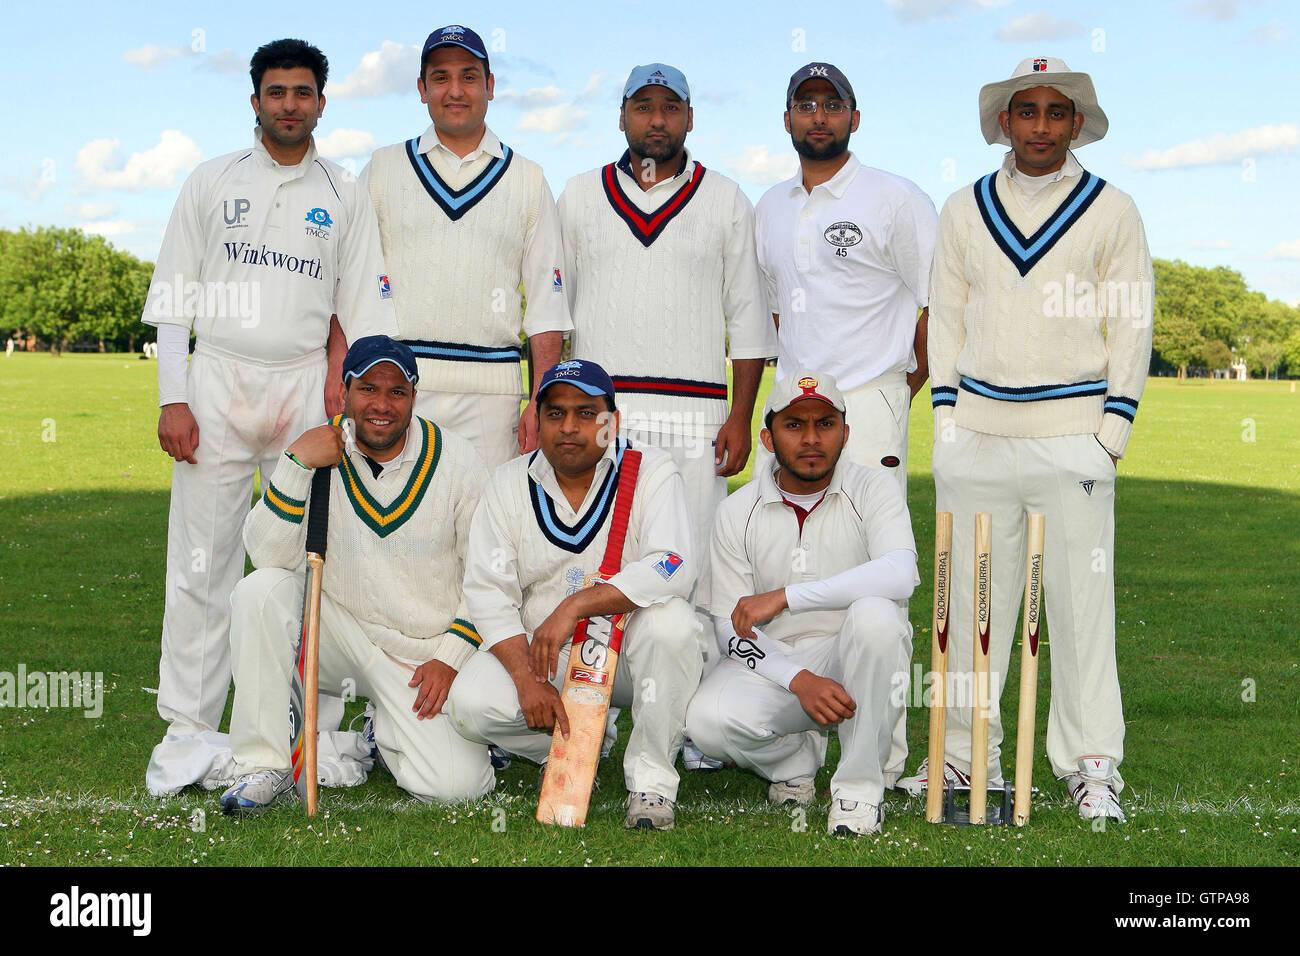 Sky CC - Victoria Park Community Cricket League - 26/05/09 Photo Stock